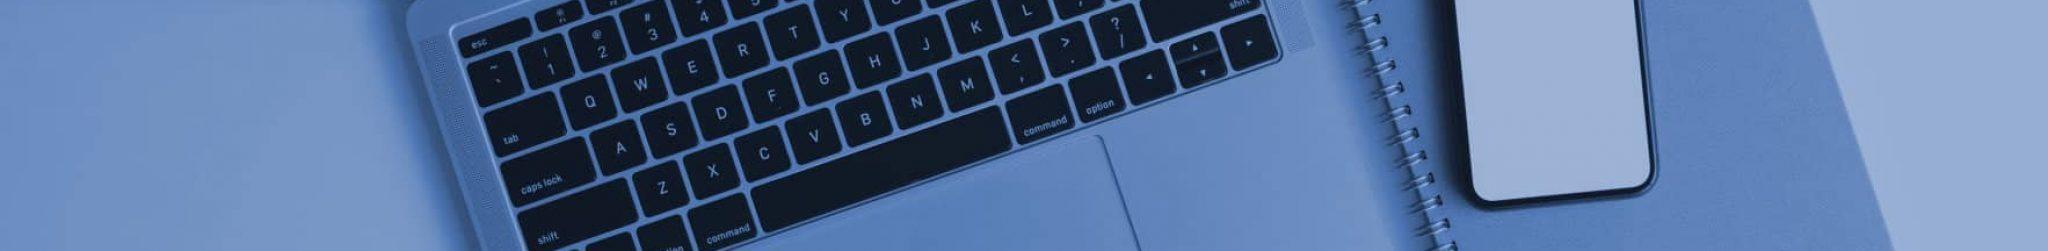 macbook-pro-beside-book-and-smartphone-3740879_bg_blau